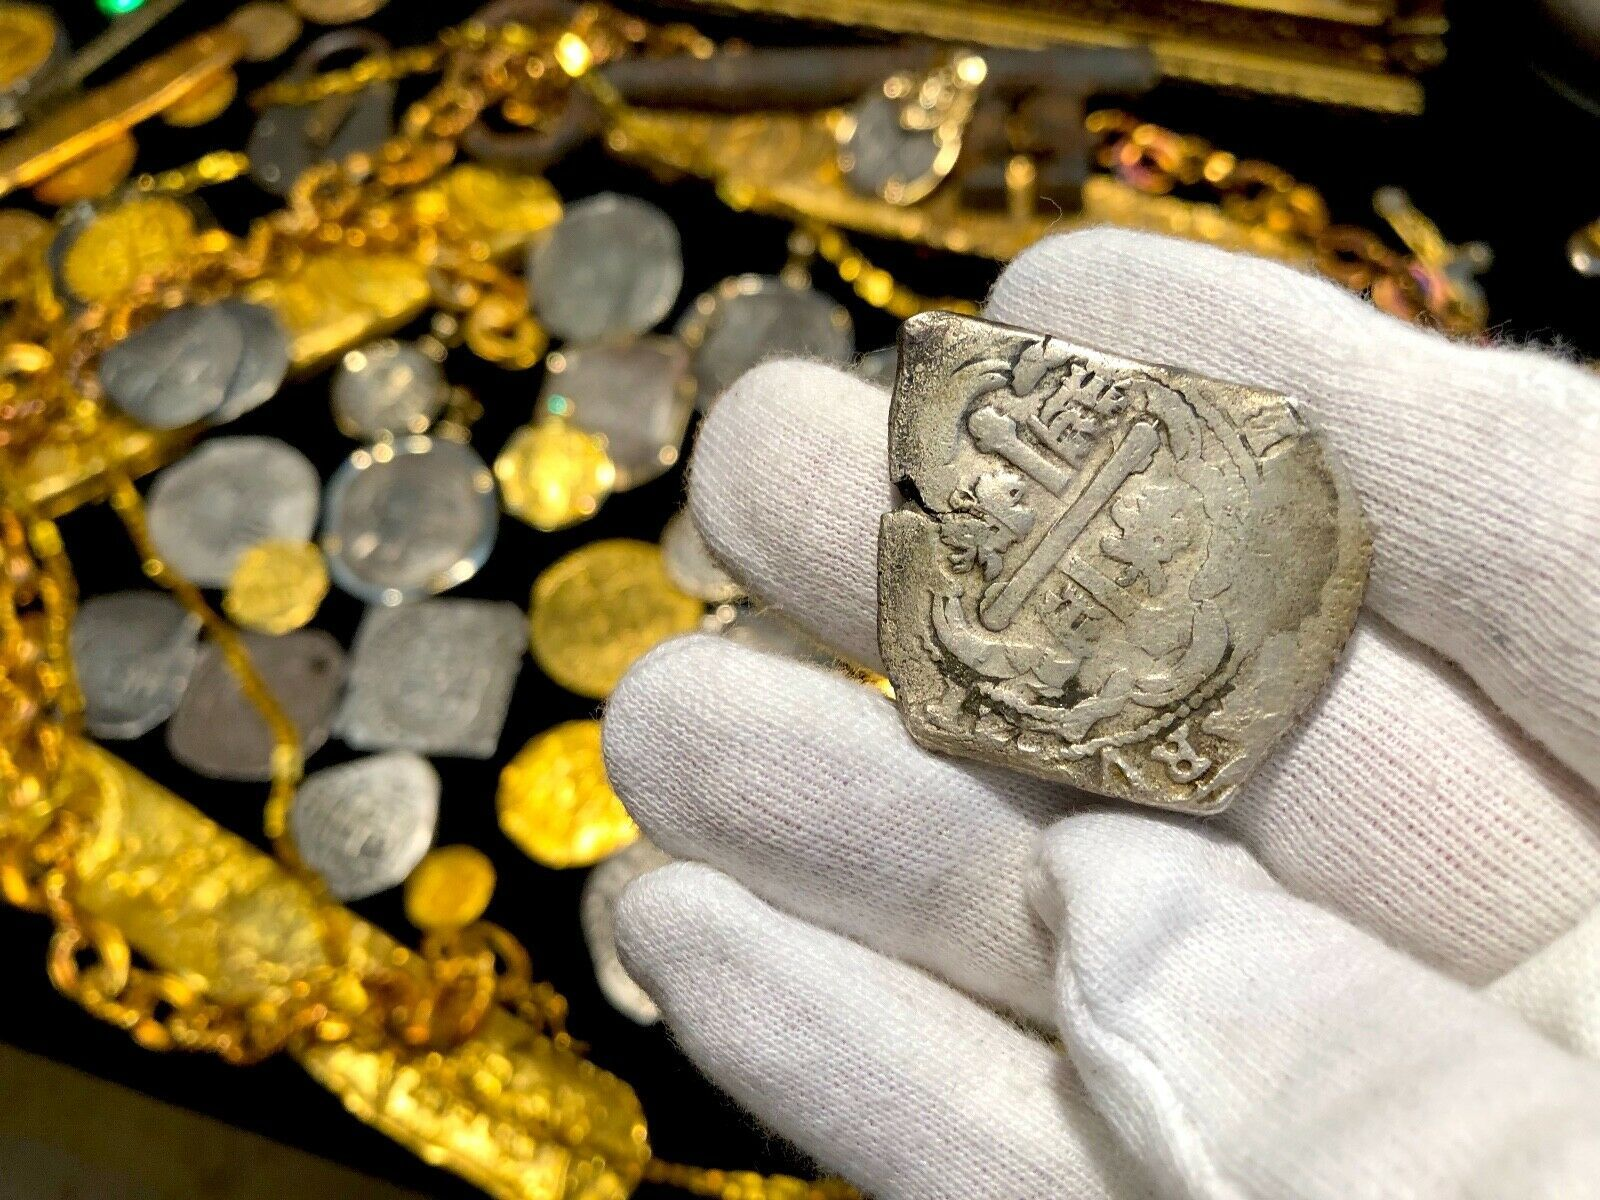 MEXICO 8 REALES 1715 FLEET SHIPWRECK REAL 8 COA LOU ULLIAN! PIRATE GOLD COINS